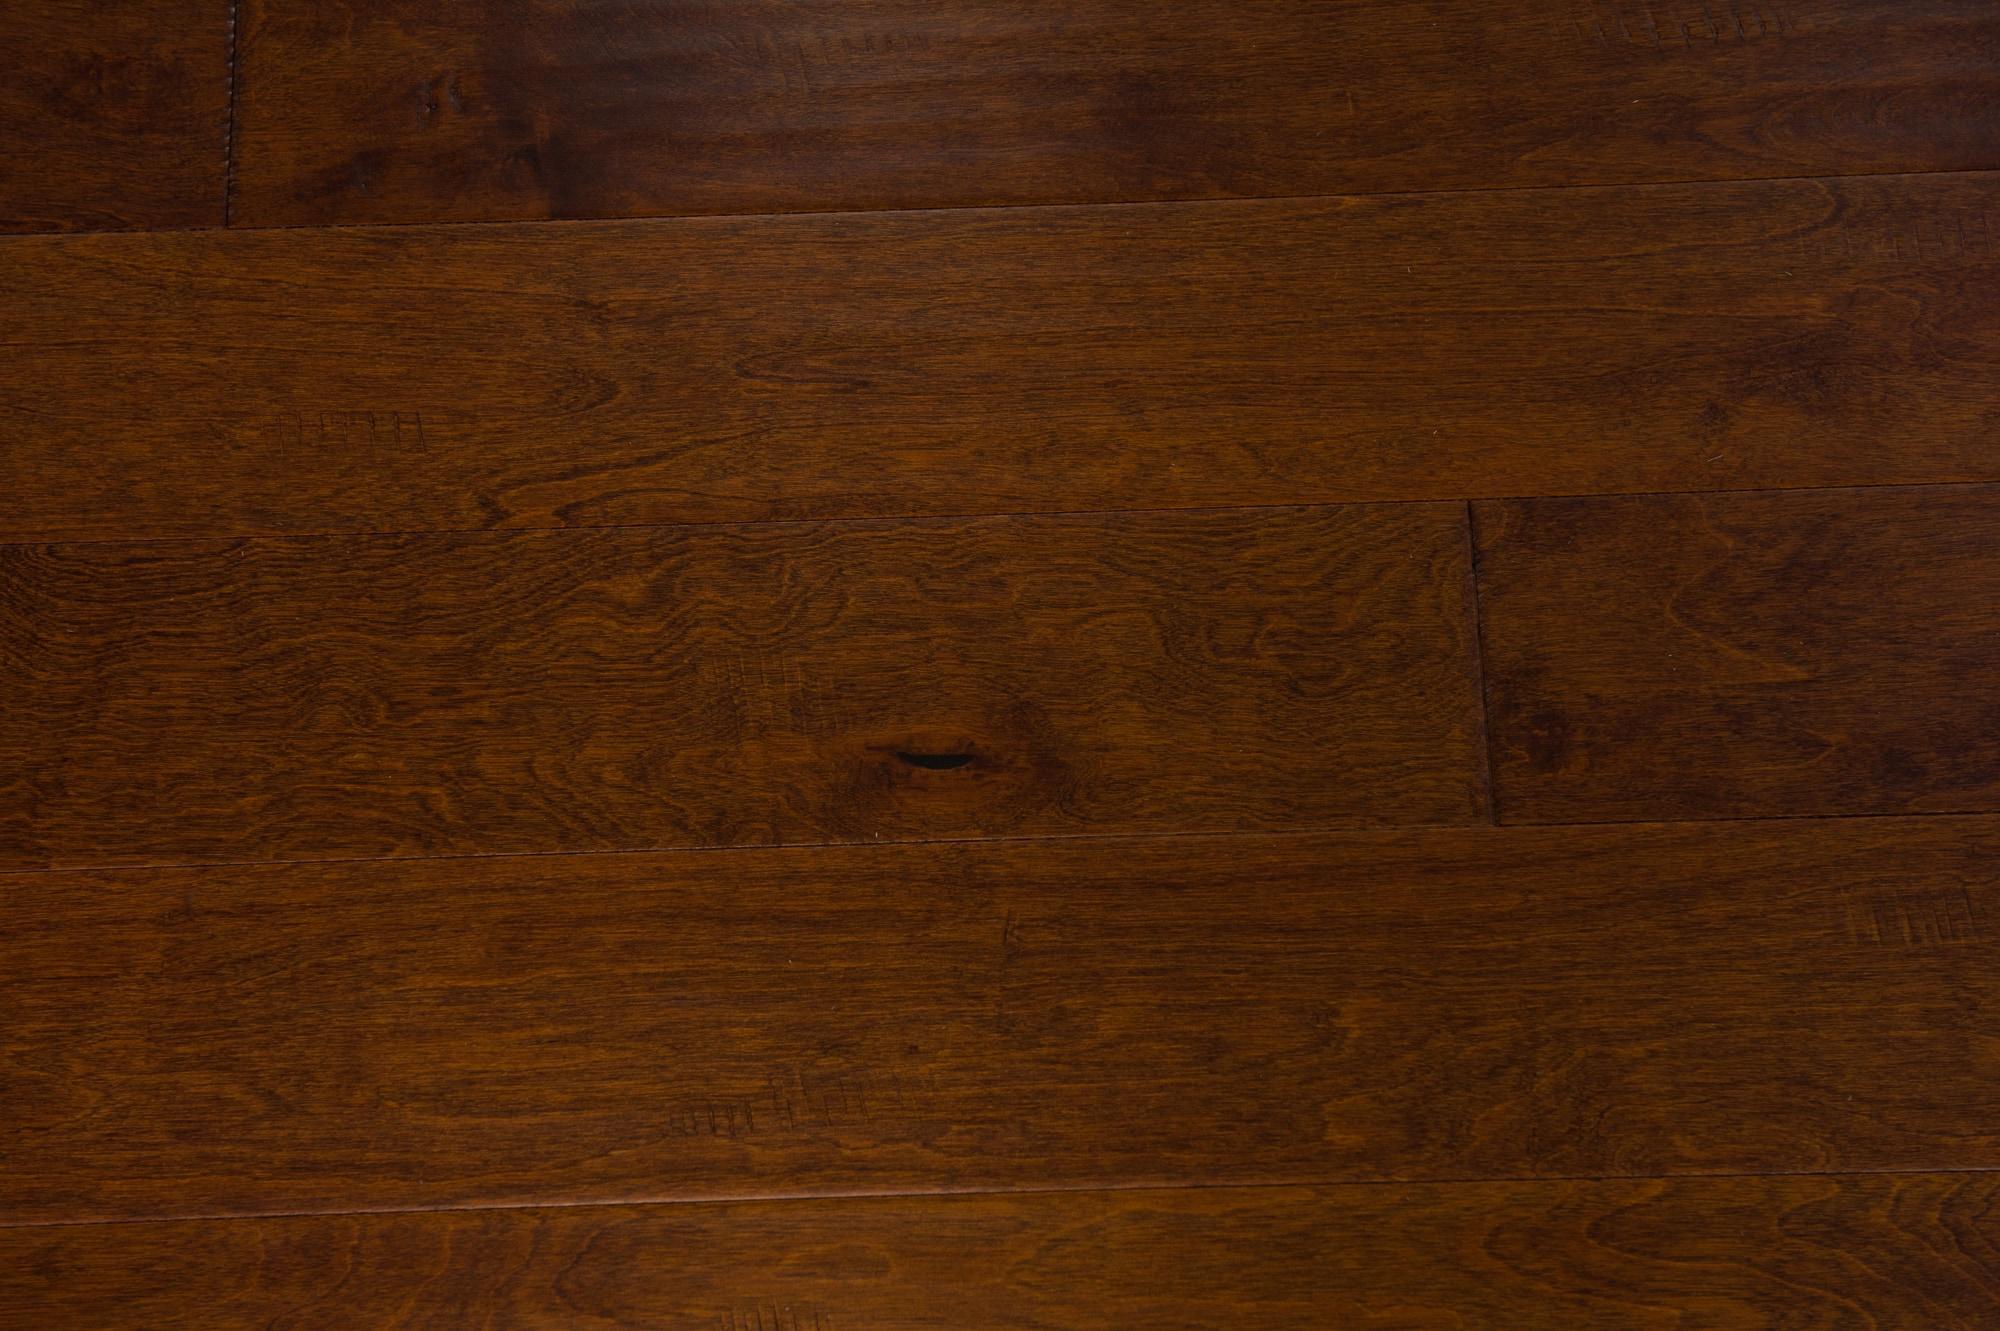 Penny / Baltic Birch / Urethane / ABC / Sample Engineered Hardwood - Baltic Birch - Bonaventure Collection 0